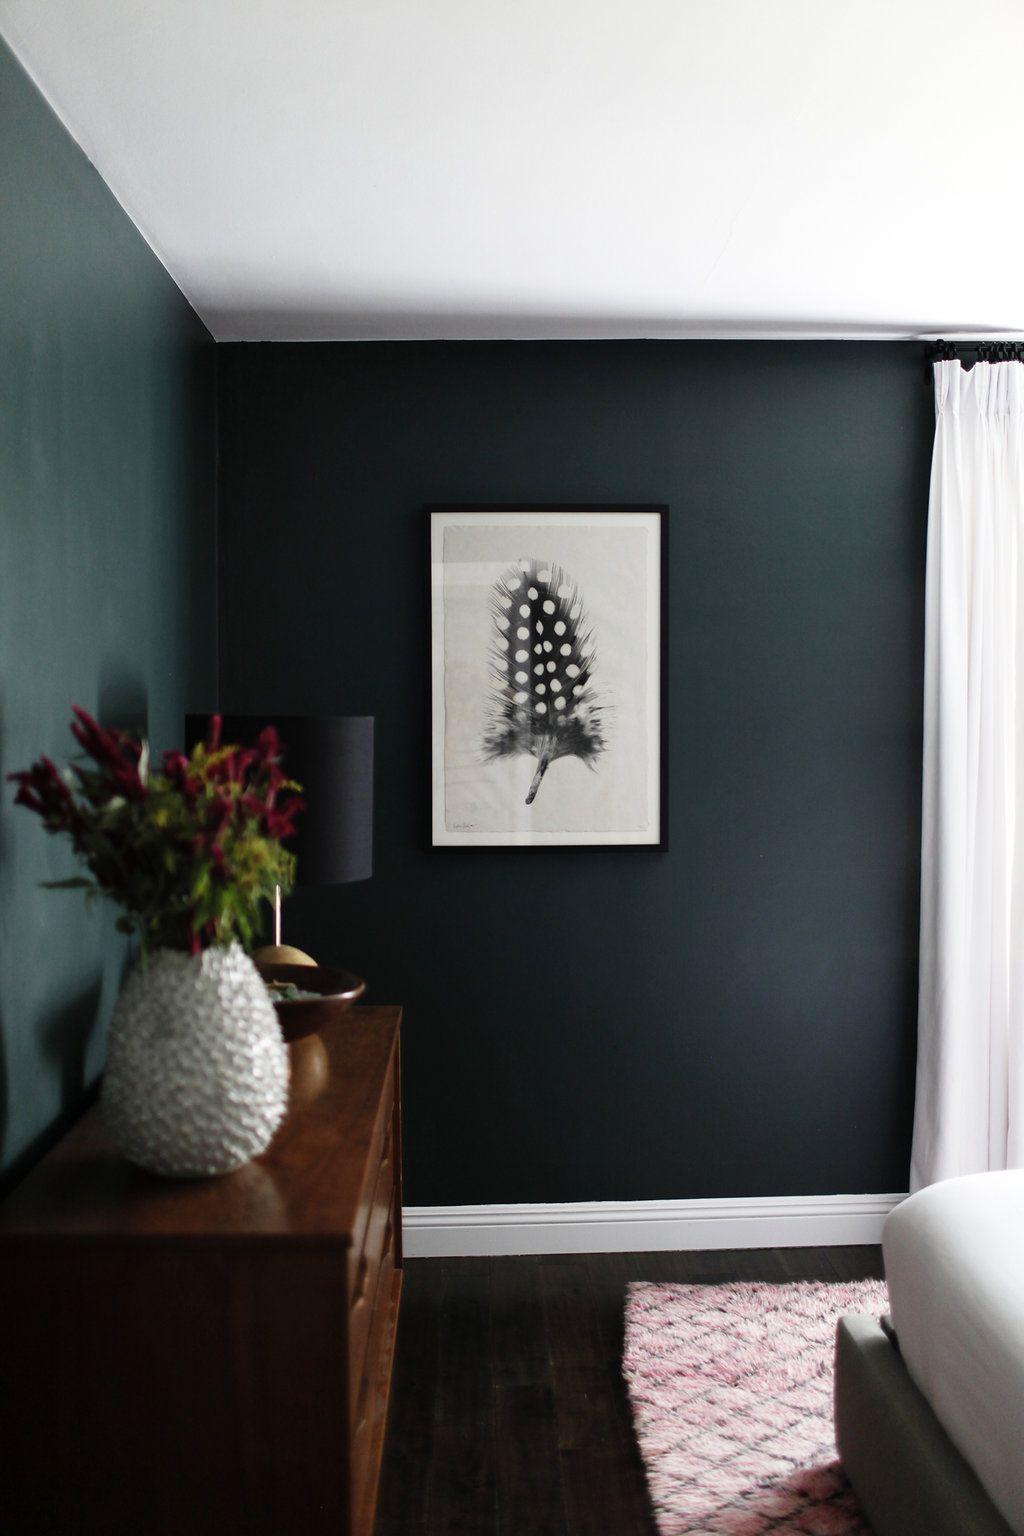 Dark green walls in minimalist bedroom | SPACES AND GEMS ...